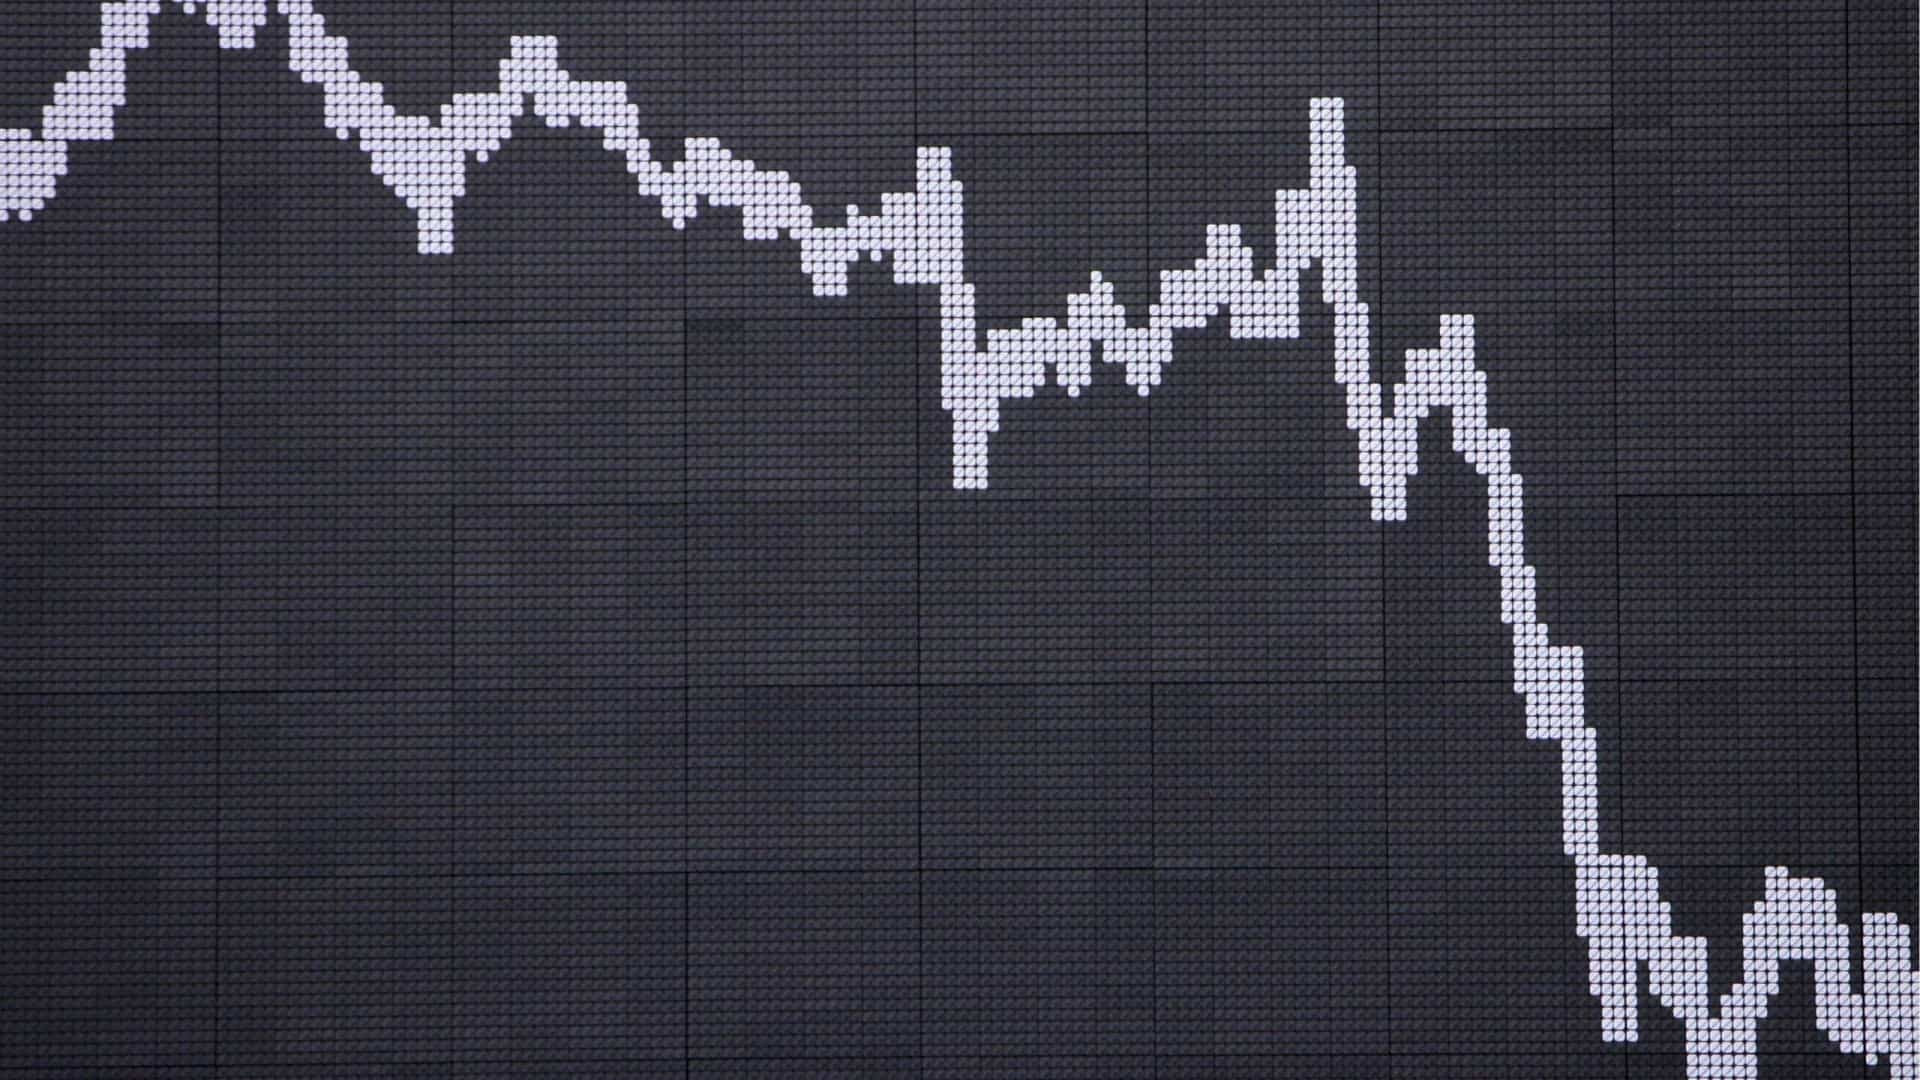 Dívida de Portugal volta a cair para mínimos